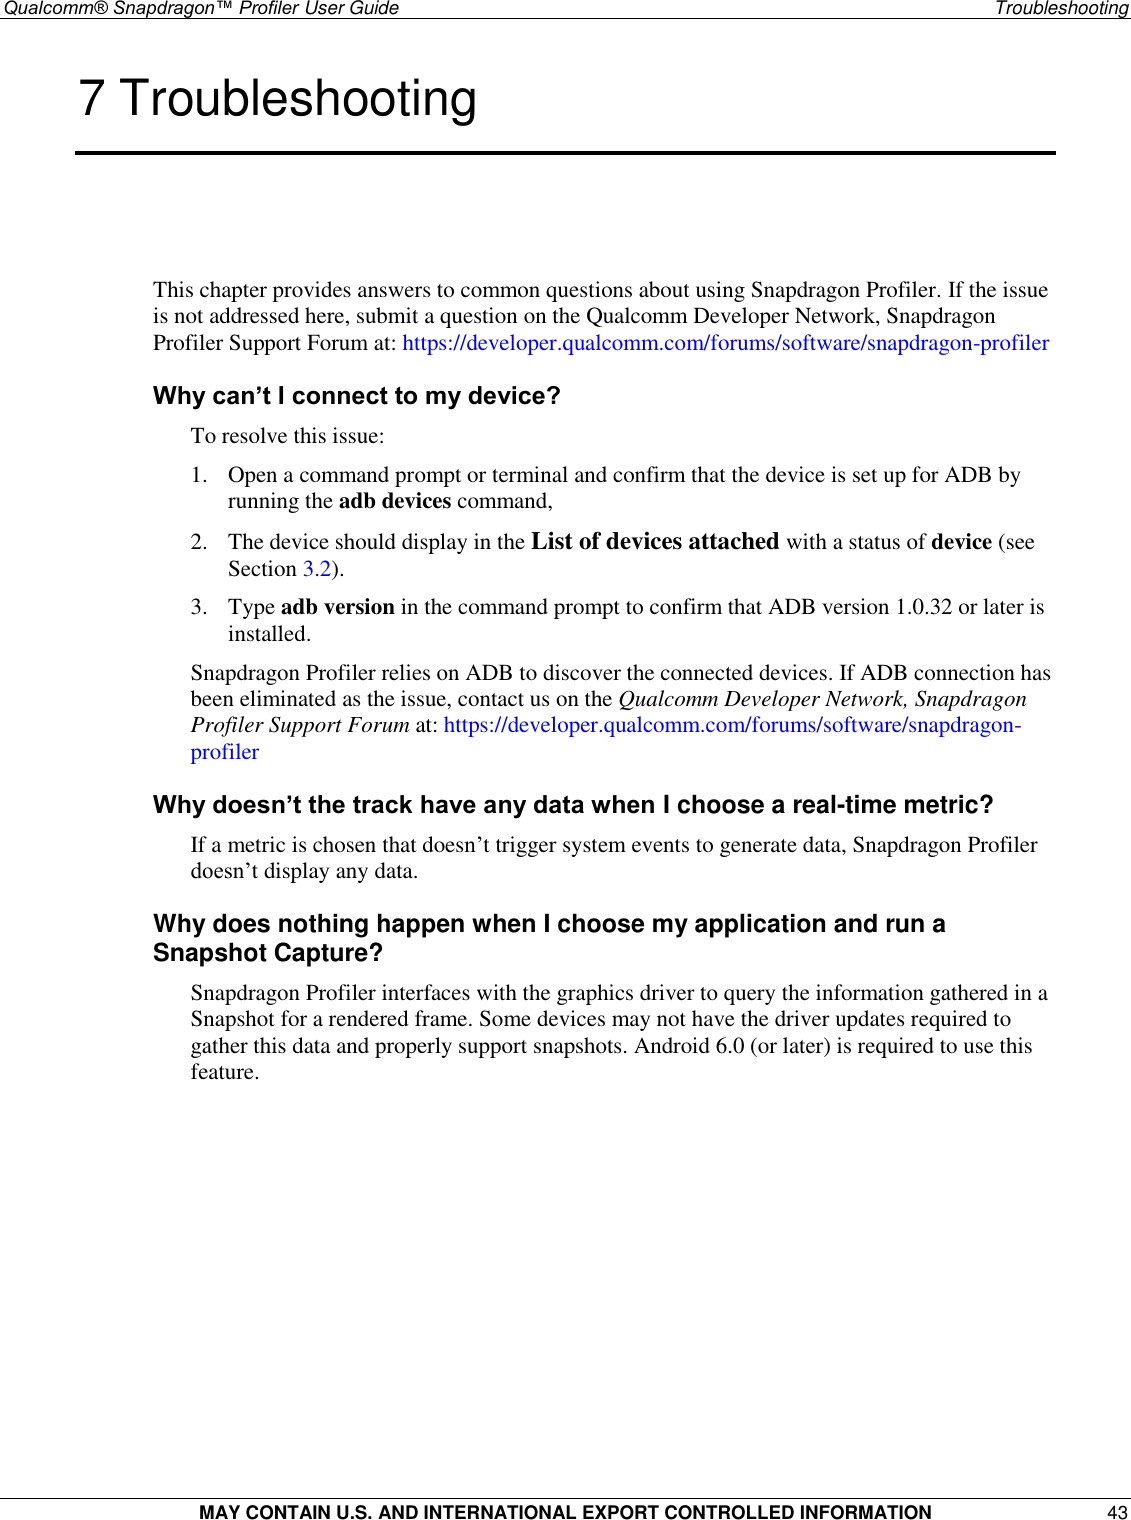 Qualcomm® Snapdragon™ Profiler User Guide Snapdragon Oct2018